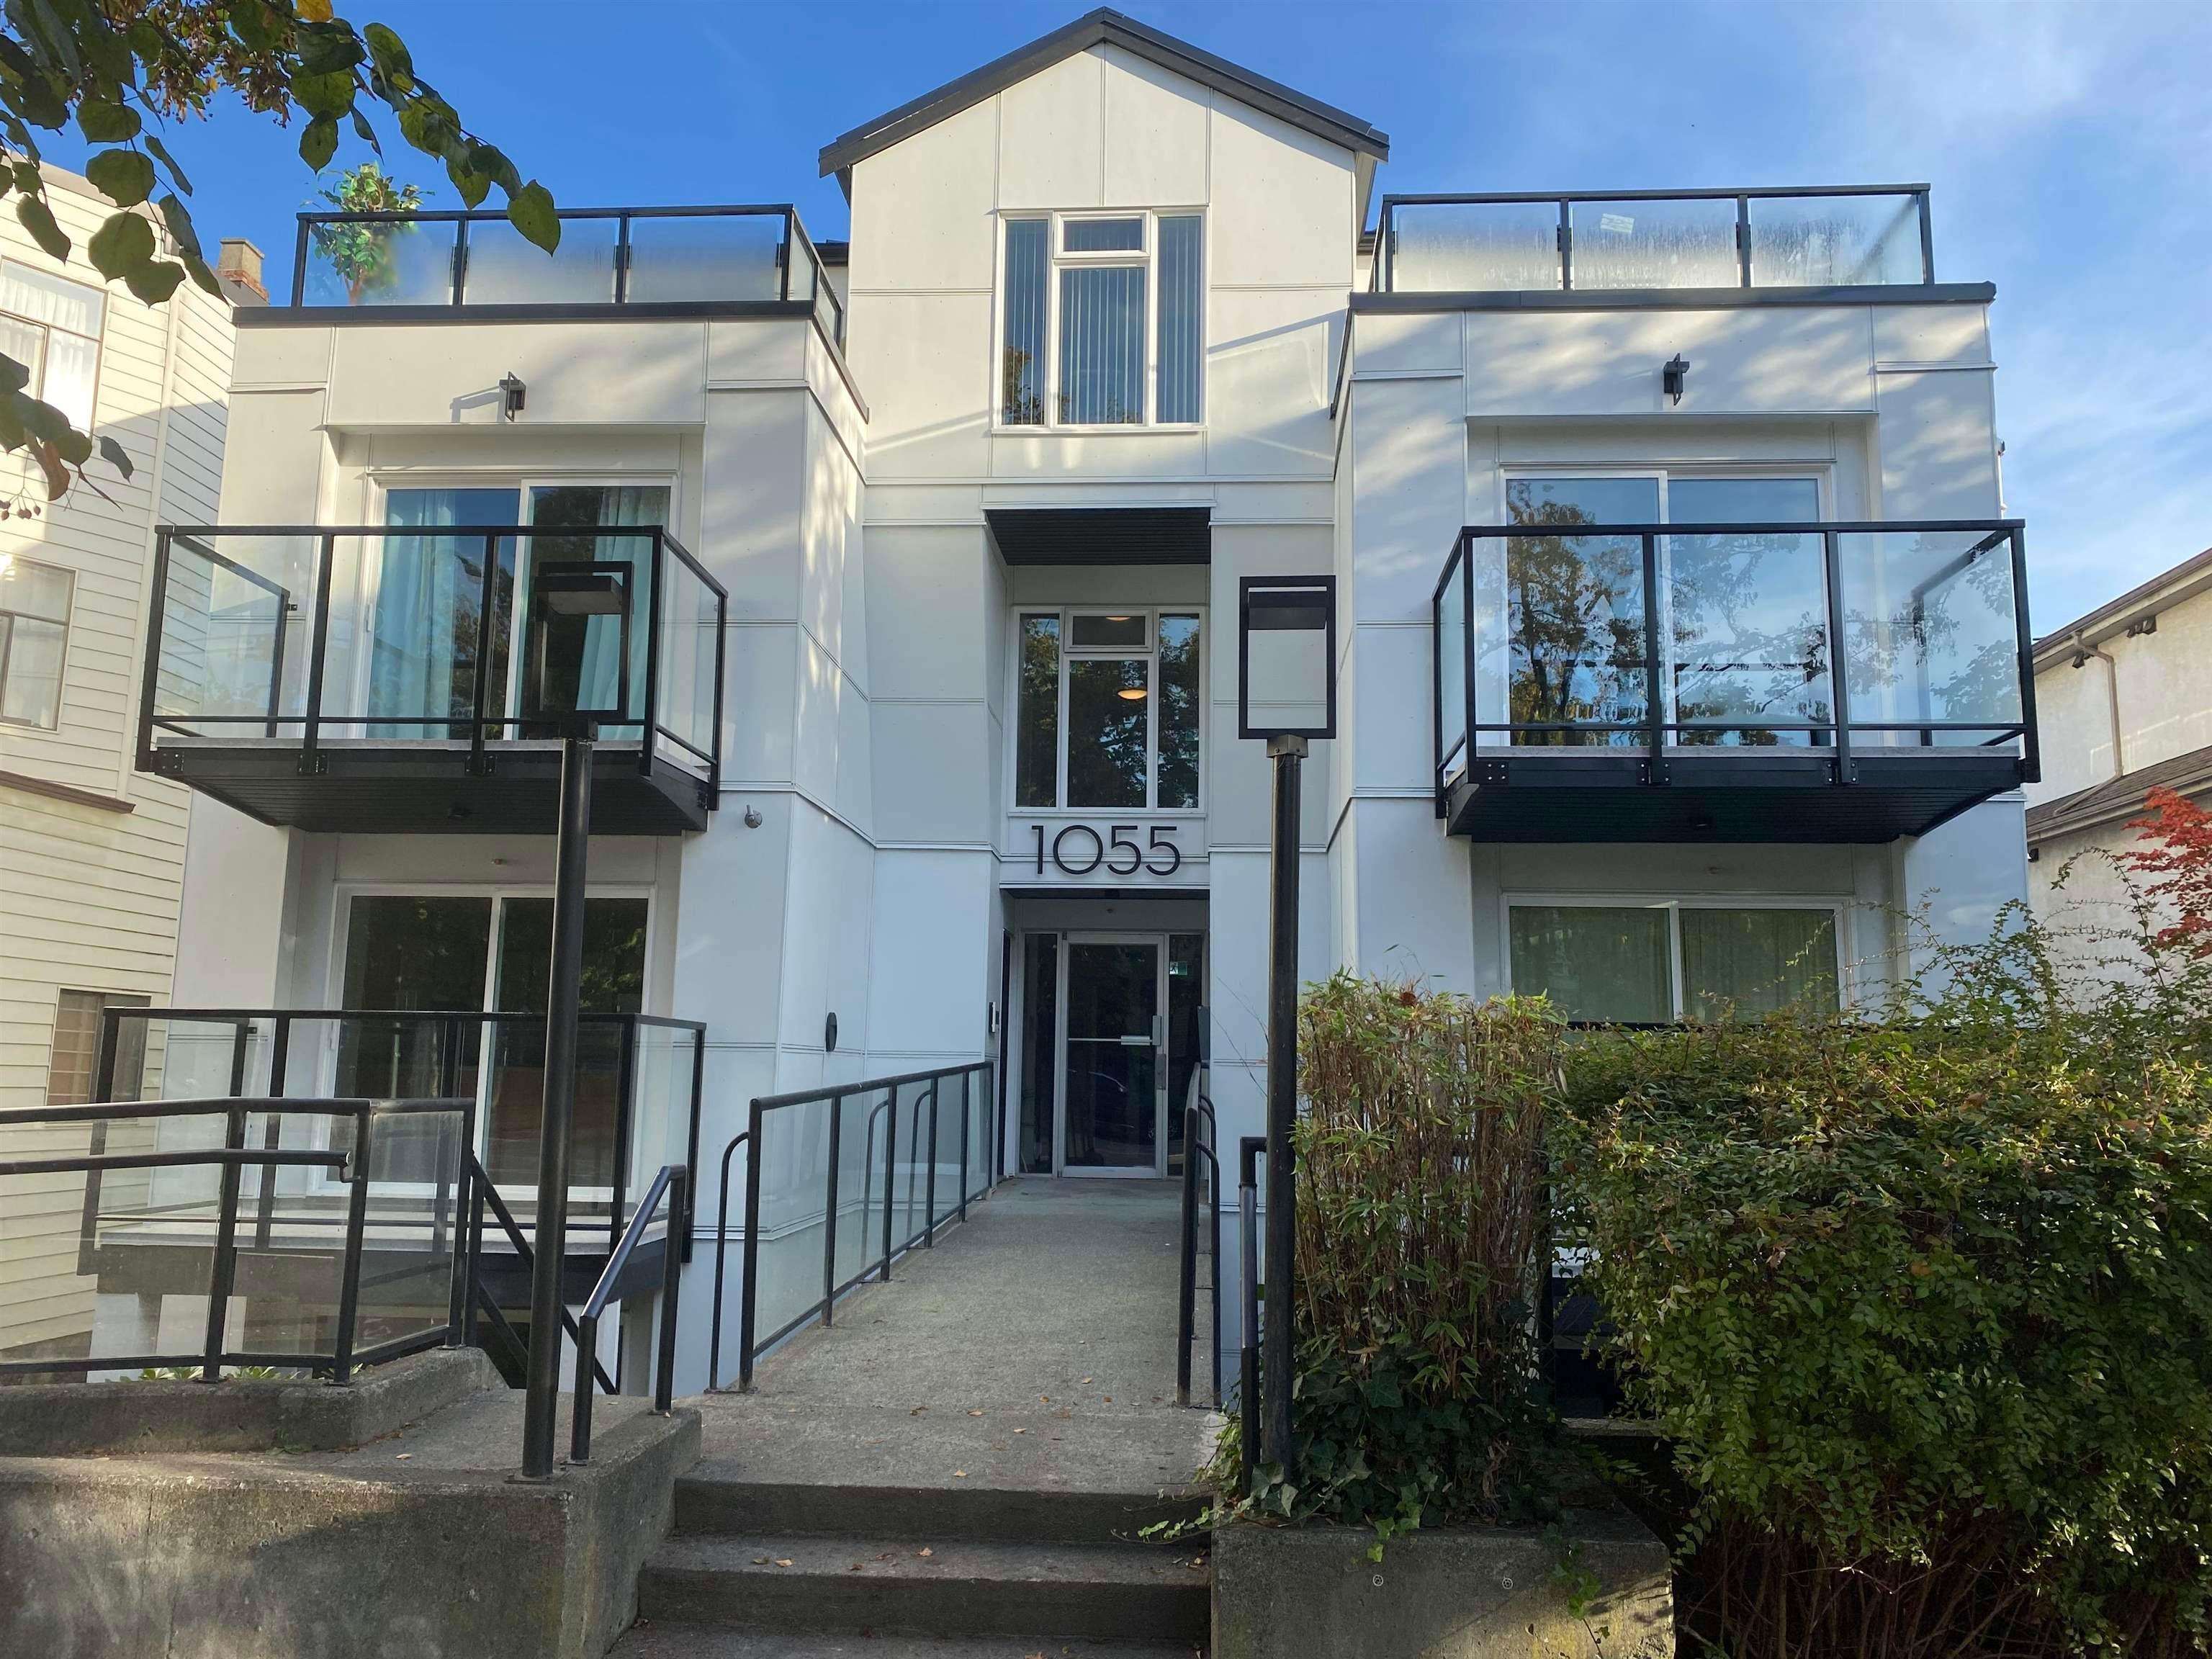 203 1055 E BROADWAY - Mount Pleasant VE Apartment/Condo for sale, 1 Bedroom (R2620878) - #1